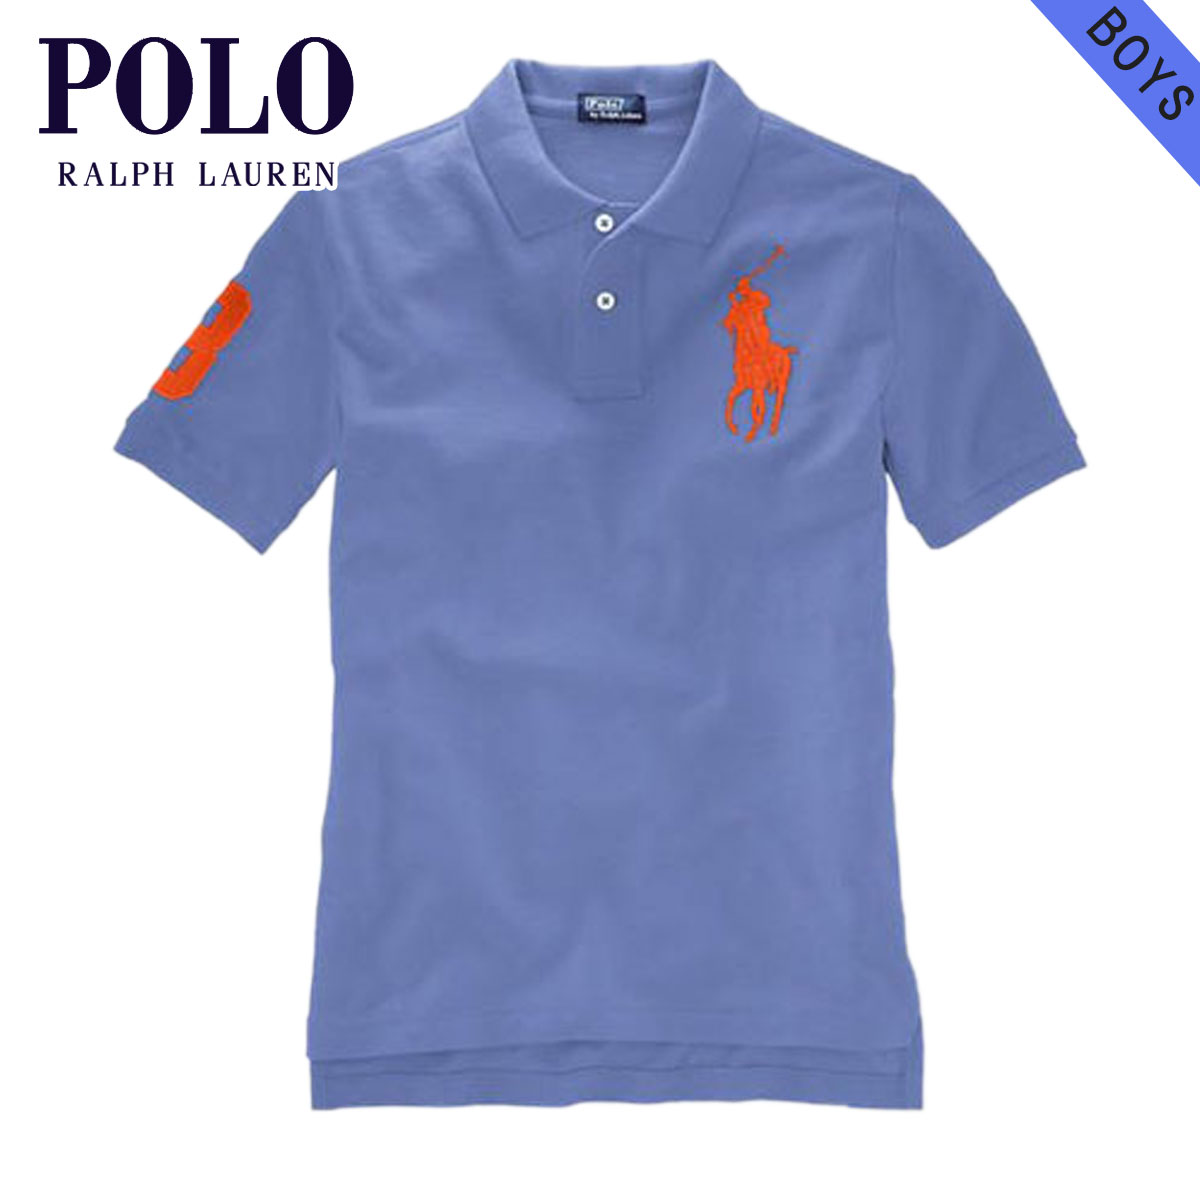 ea07e658bdeb6 Poloralflorenkids POLO RALPH LAUREN CHILDREN genuine kids clothing boys Polo  Shirt Big Pony Polo Shirt  15673586 BLUE 10P22Jul14